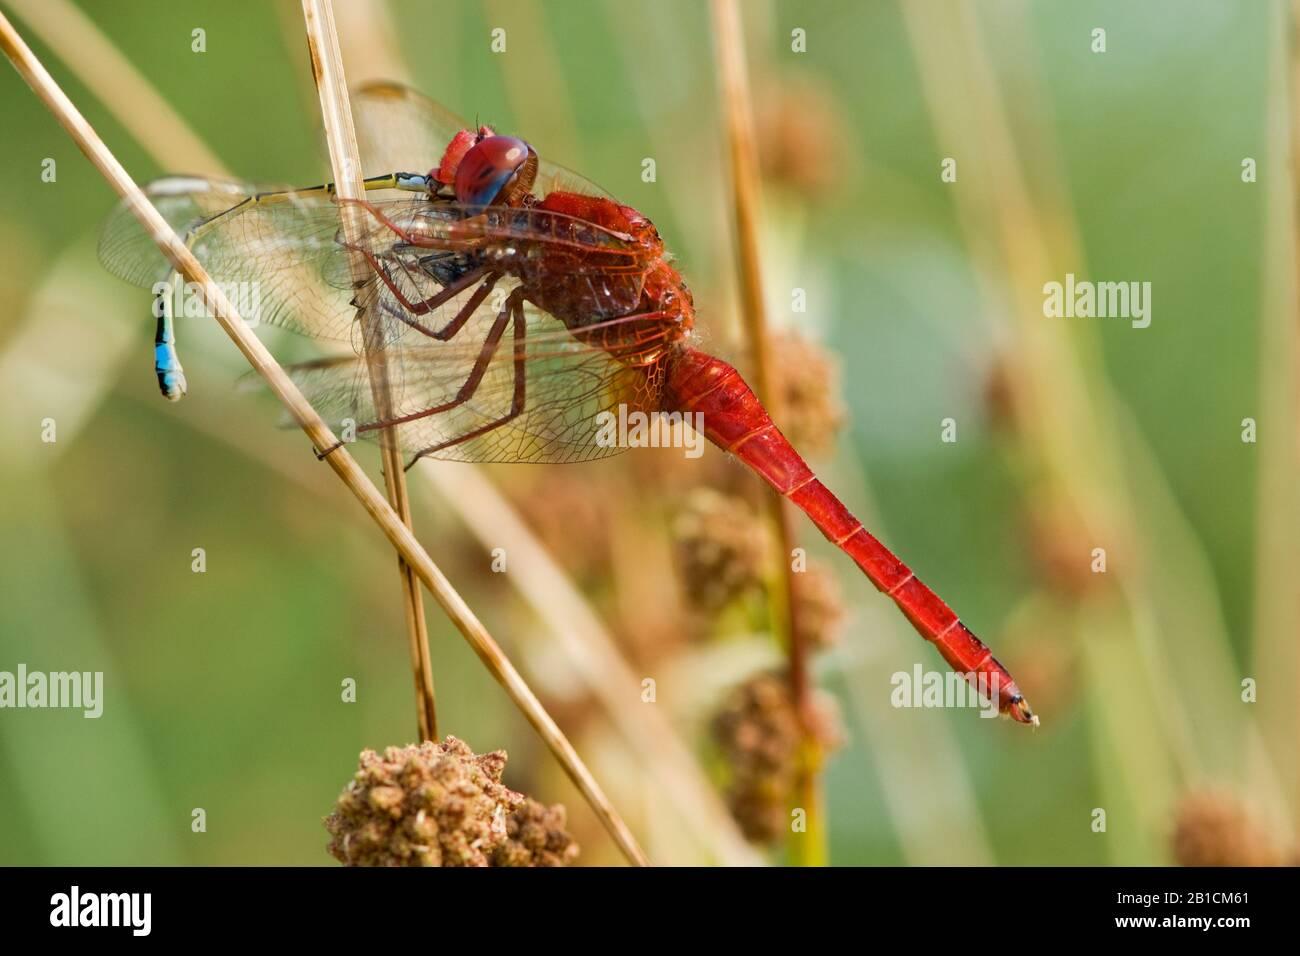 Broad Scarlet, Common Scarlet-darter, Scarlet Darter, Scarlet Dragonfly (Crocothemis erythraea, Croccothemis erythraea), male, Spain, Huelva Stock Photo